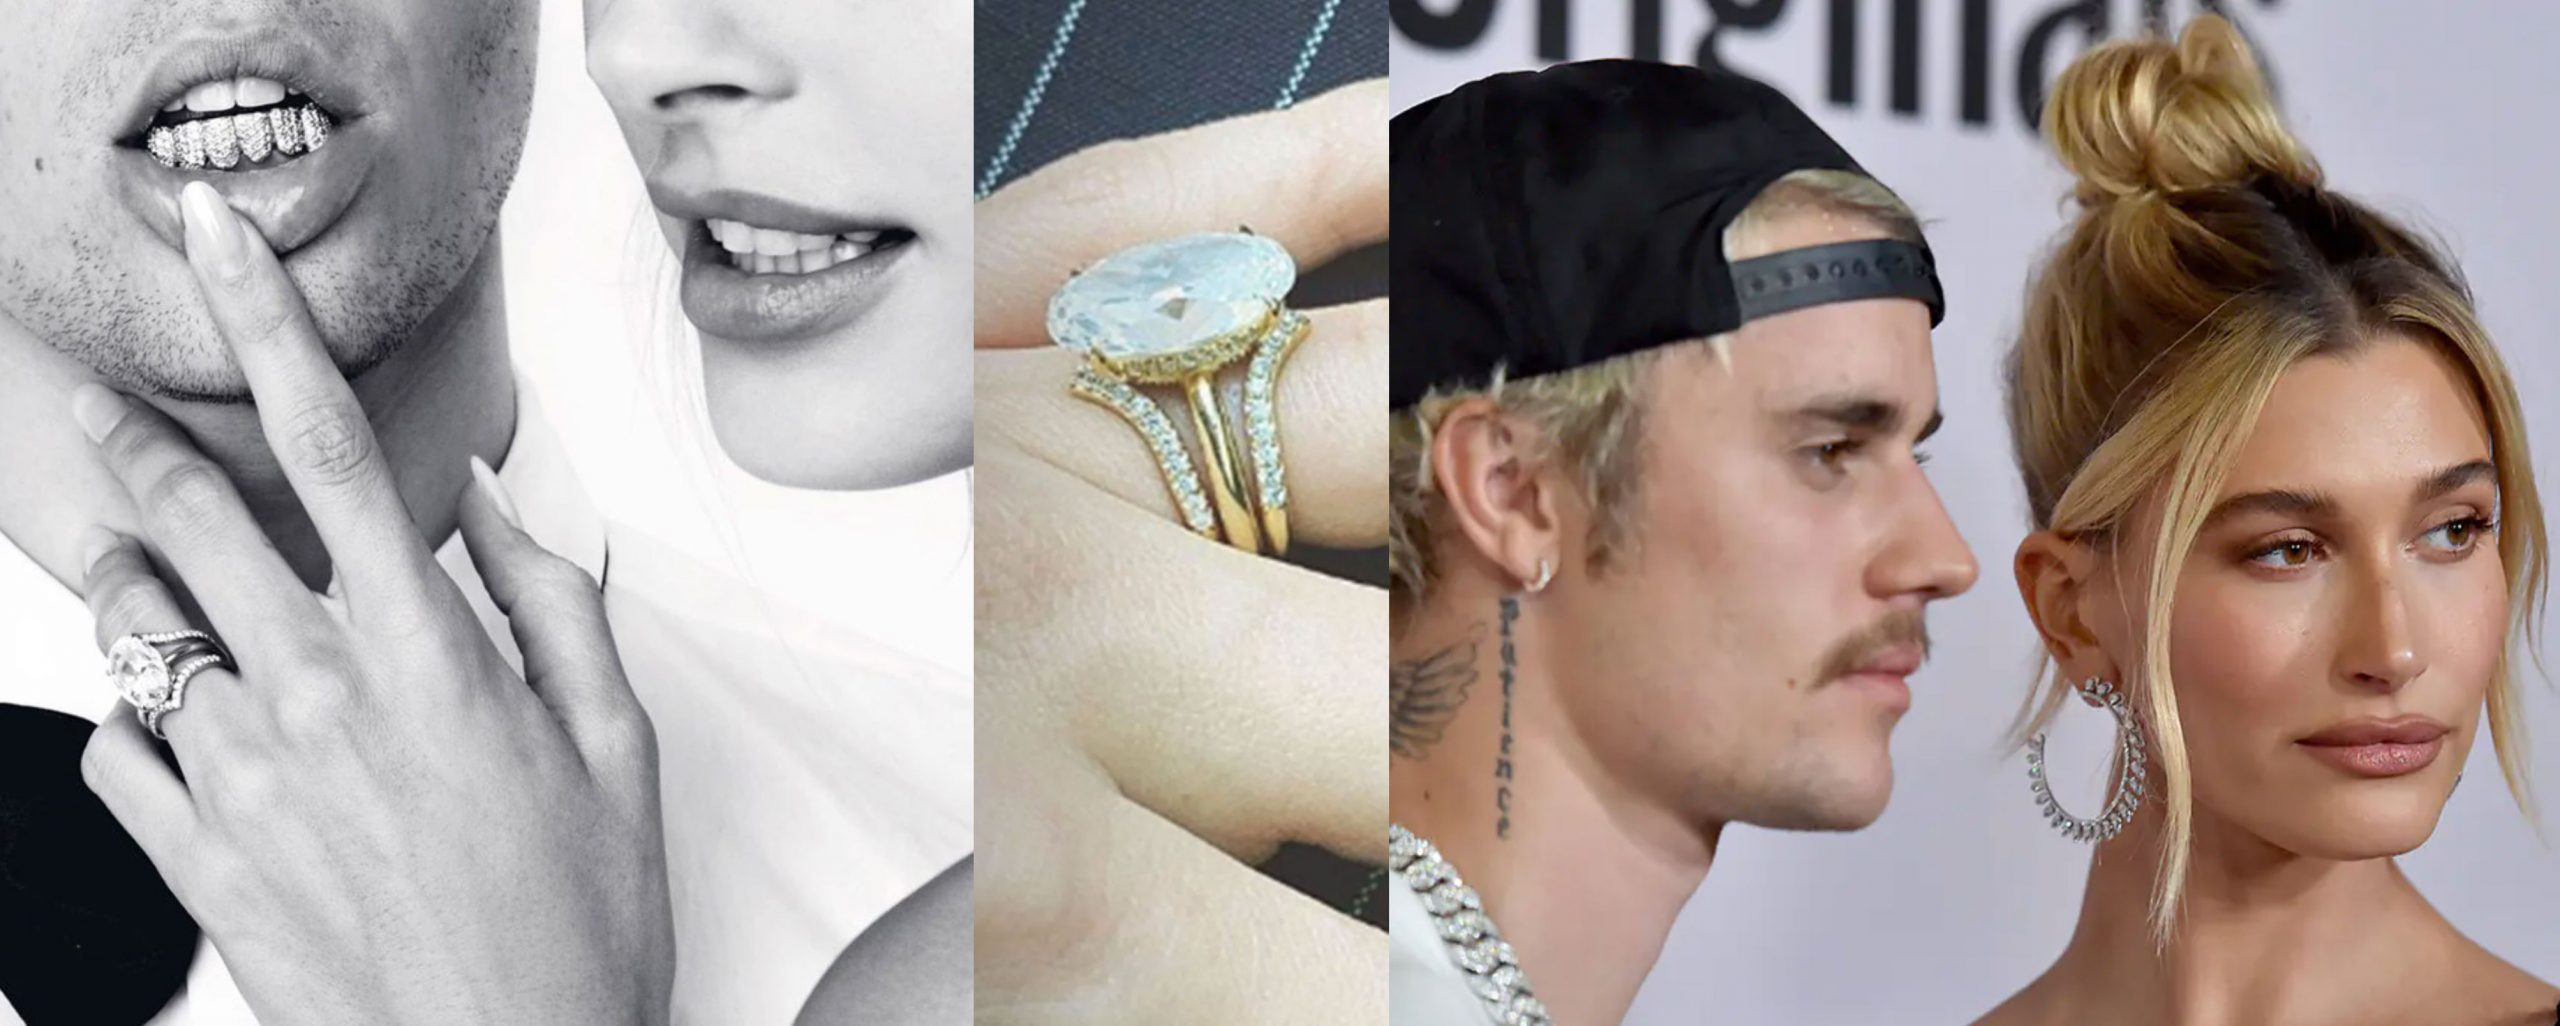 Hailey Bieber engagement ring